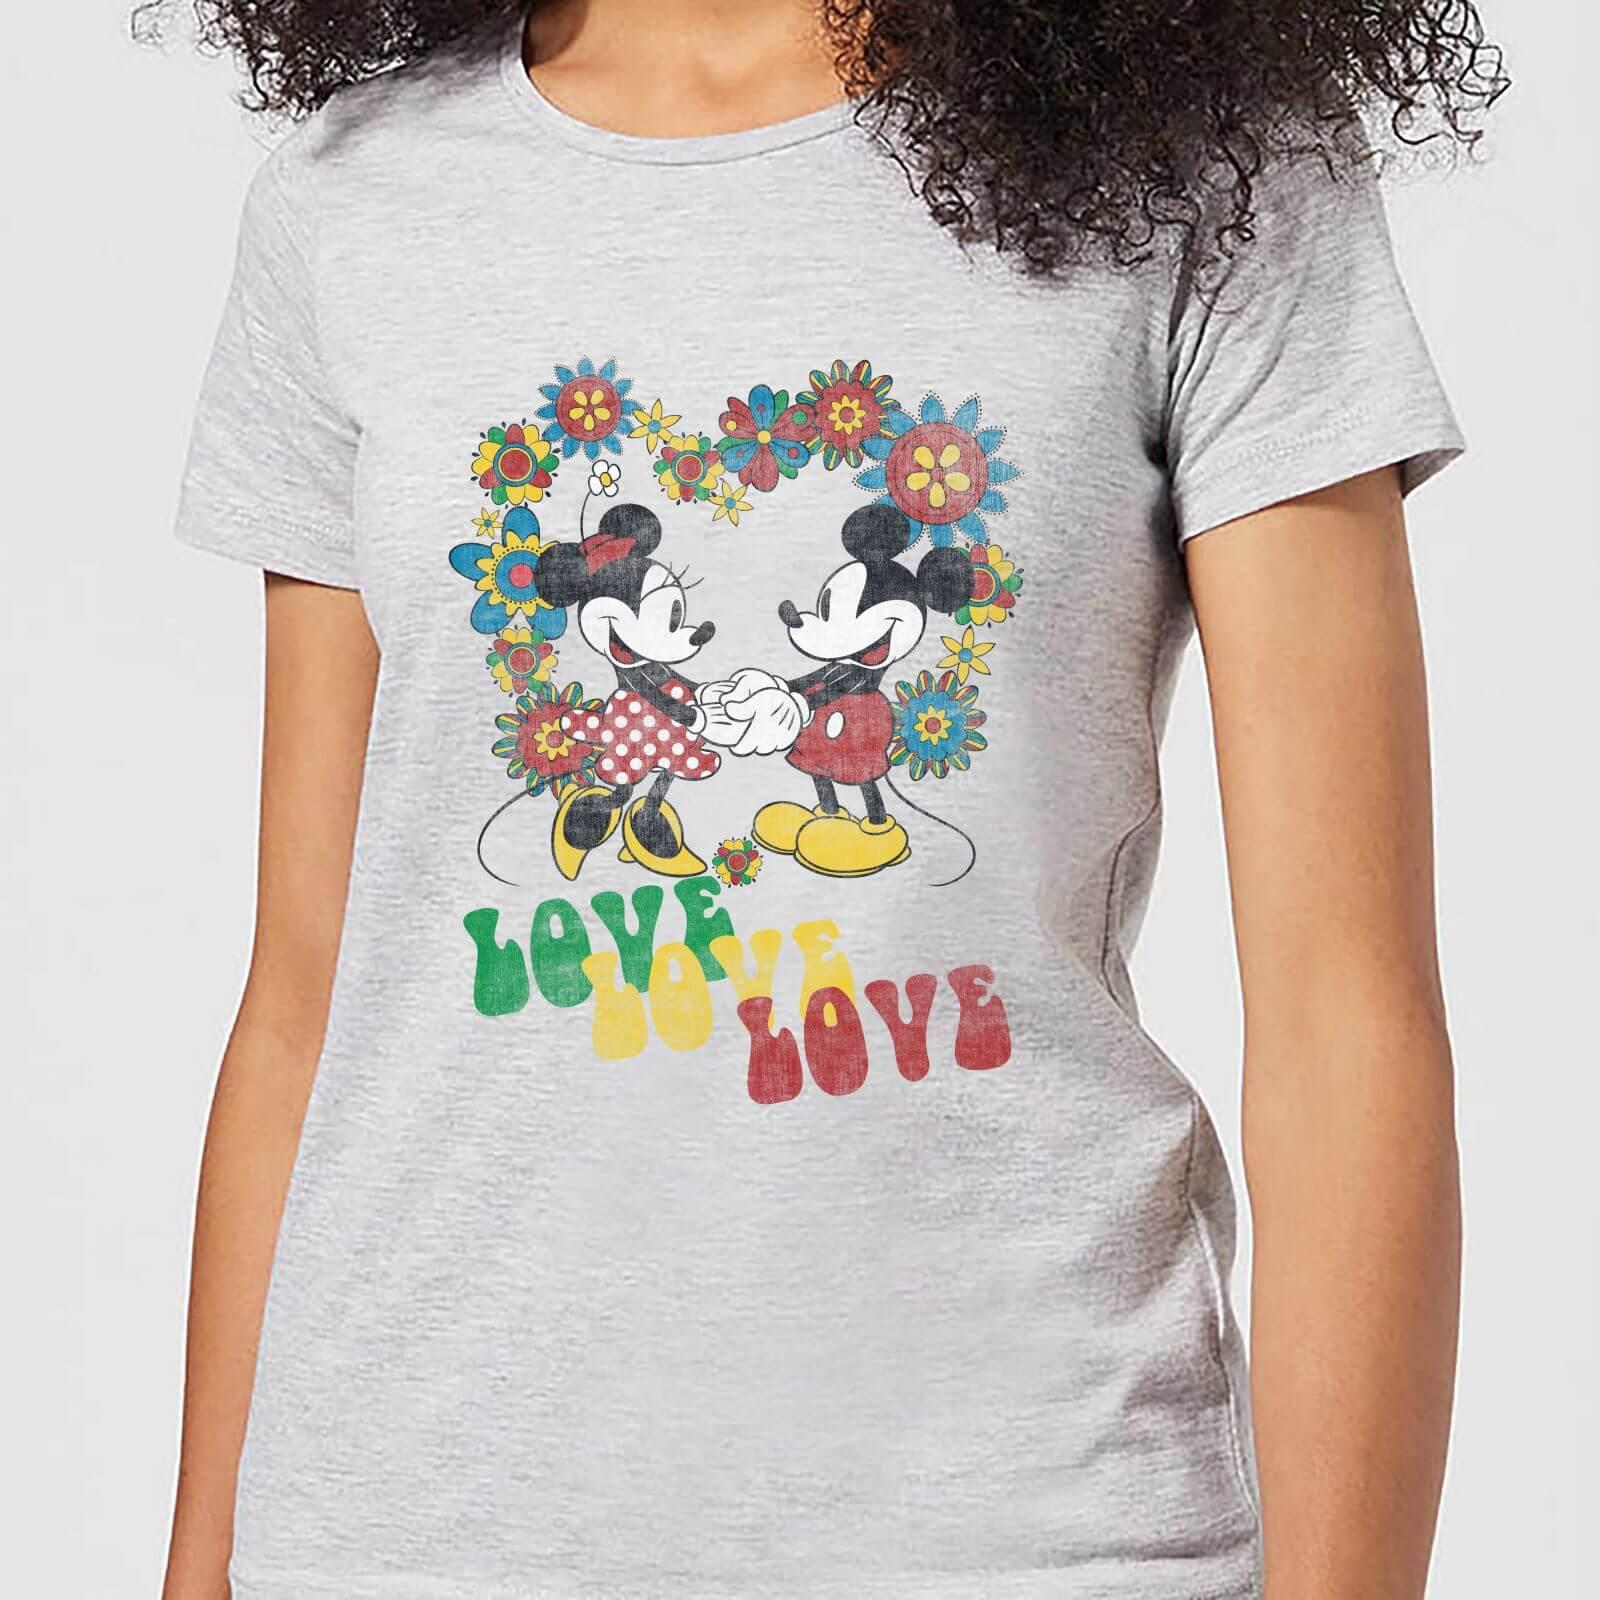 Disney Mickey Mouse Hippie Love Women's T-Shirt - Grey - XL - Grey